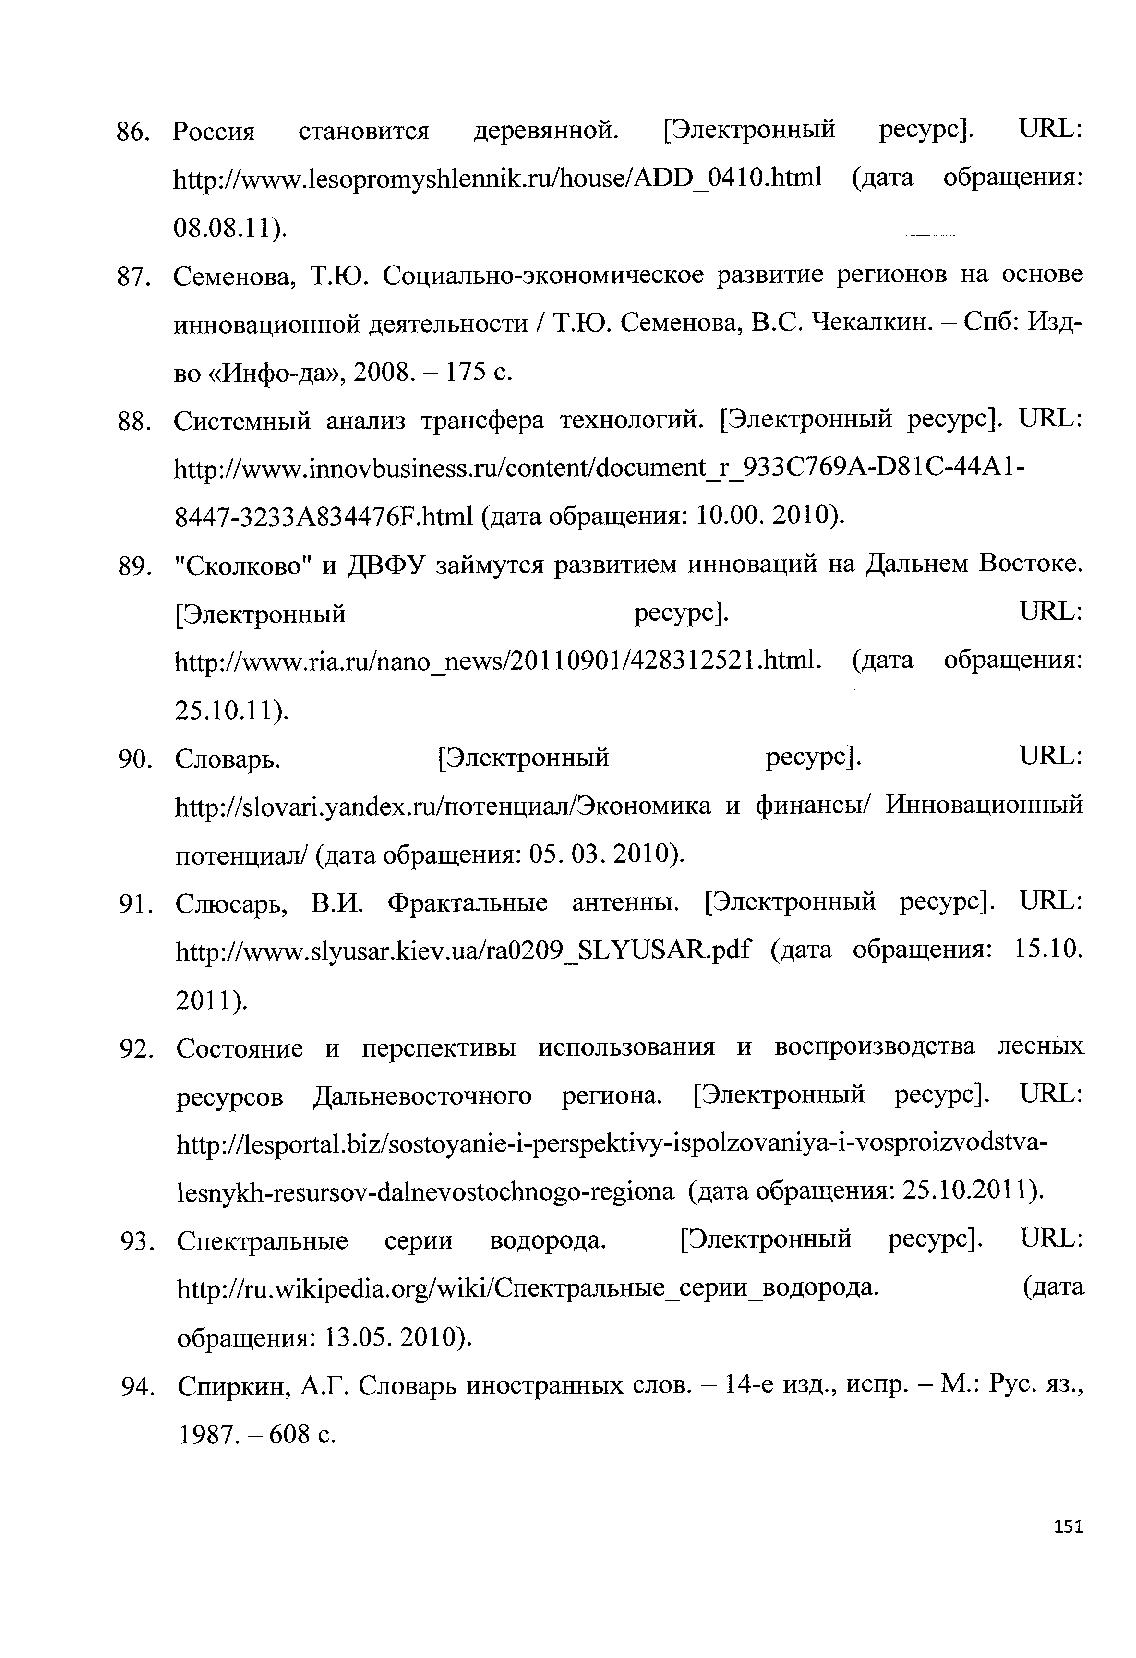 ivanova p png c 151 диссертации